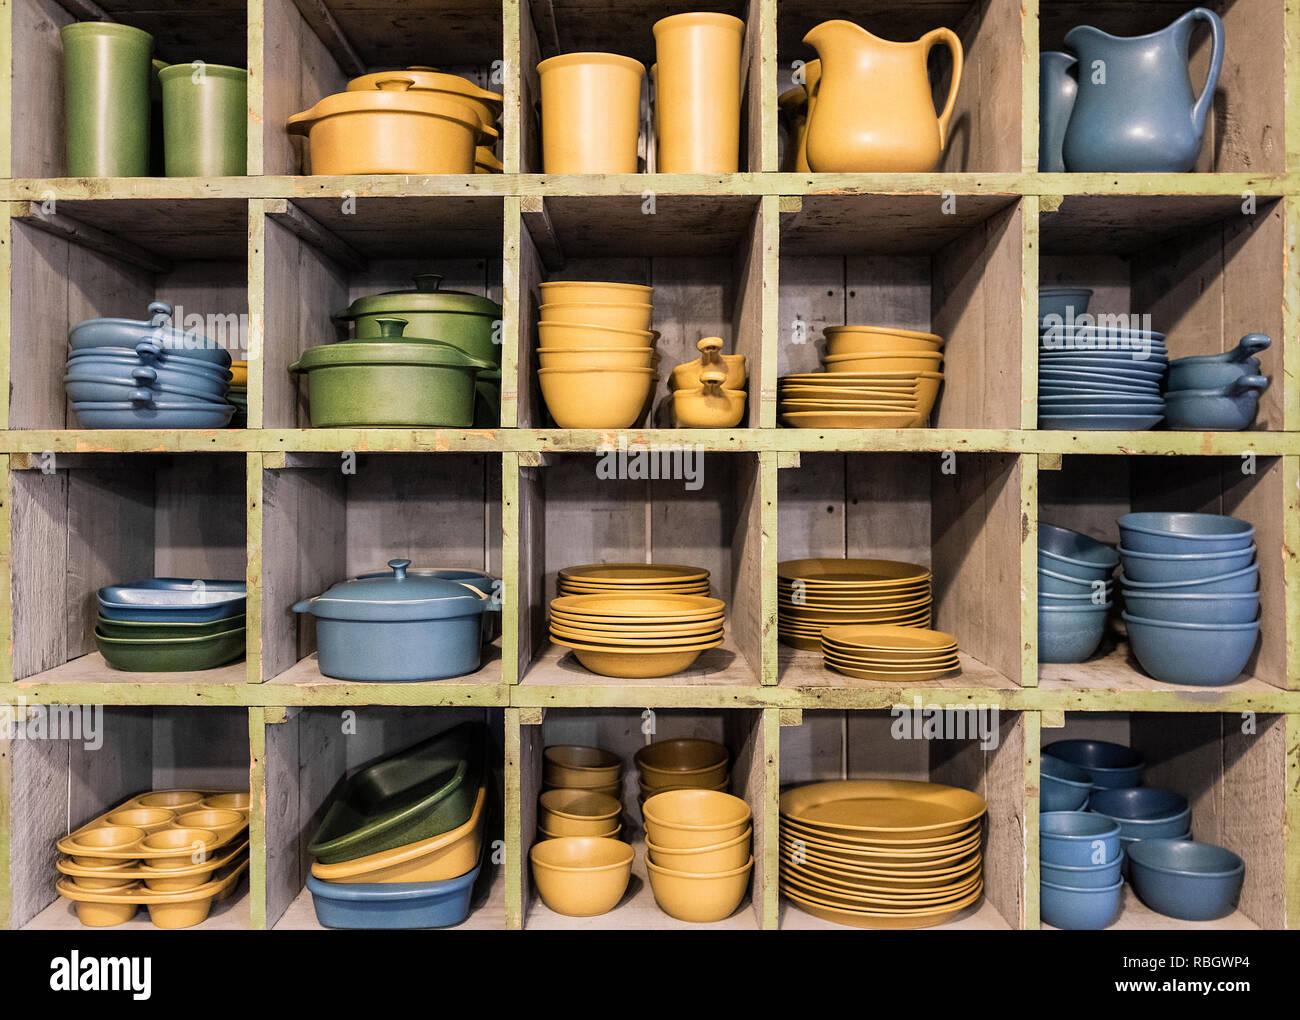 Flatware pottery for sale in a studio shop, Bennington Potters, Bennington, Vermont, USA. - Stock Image